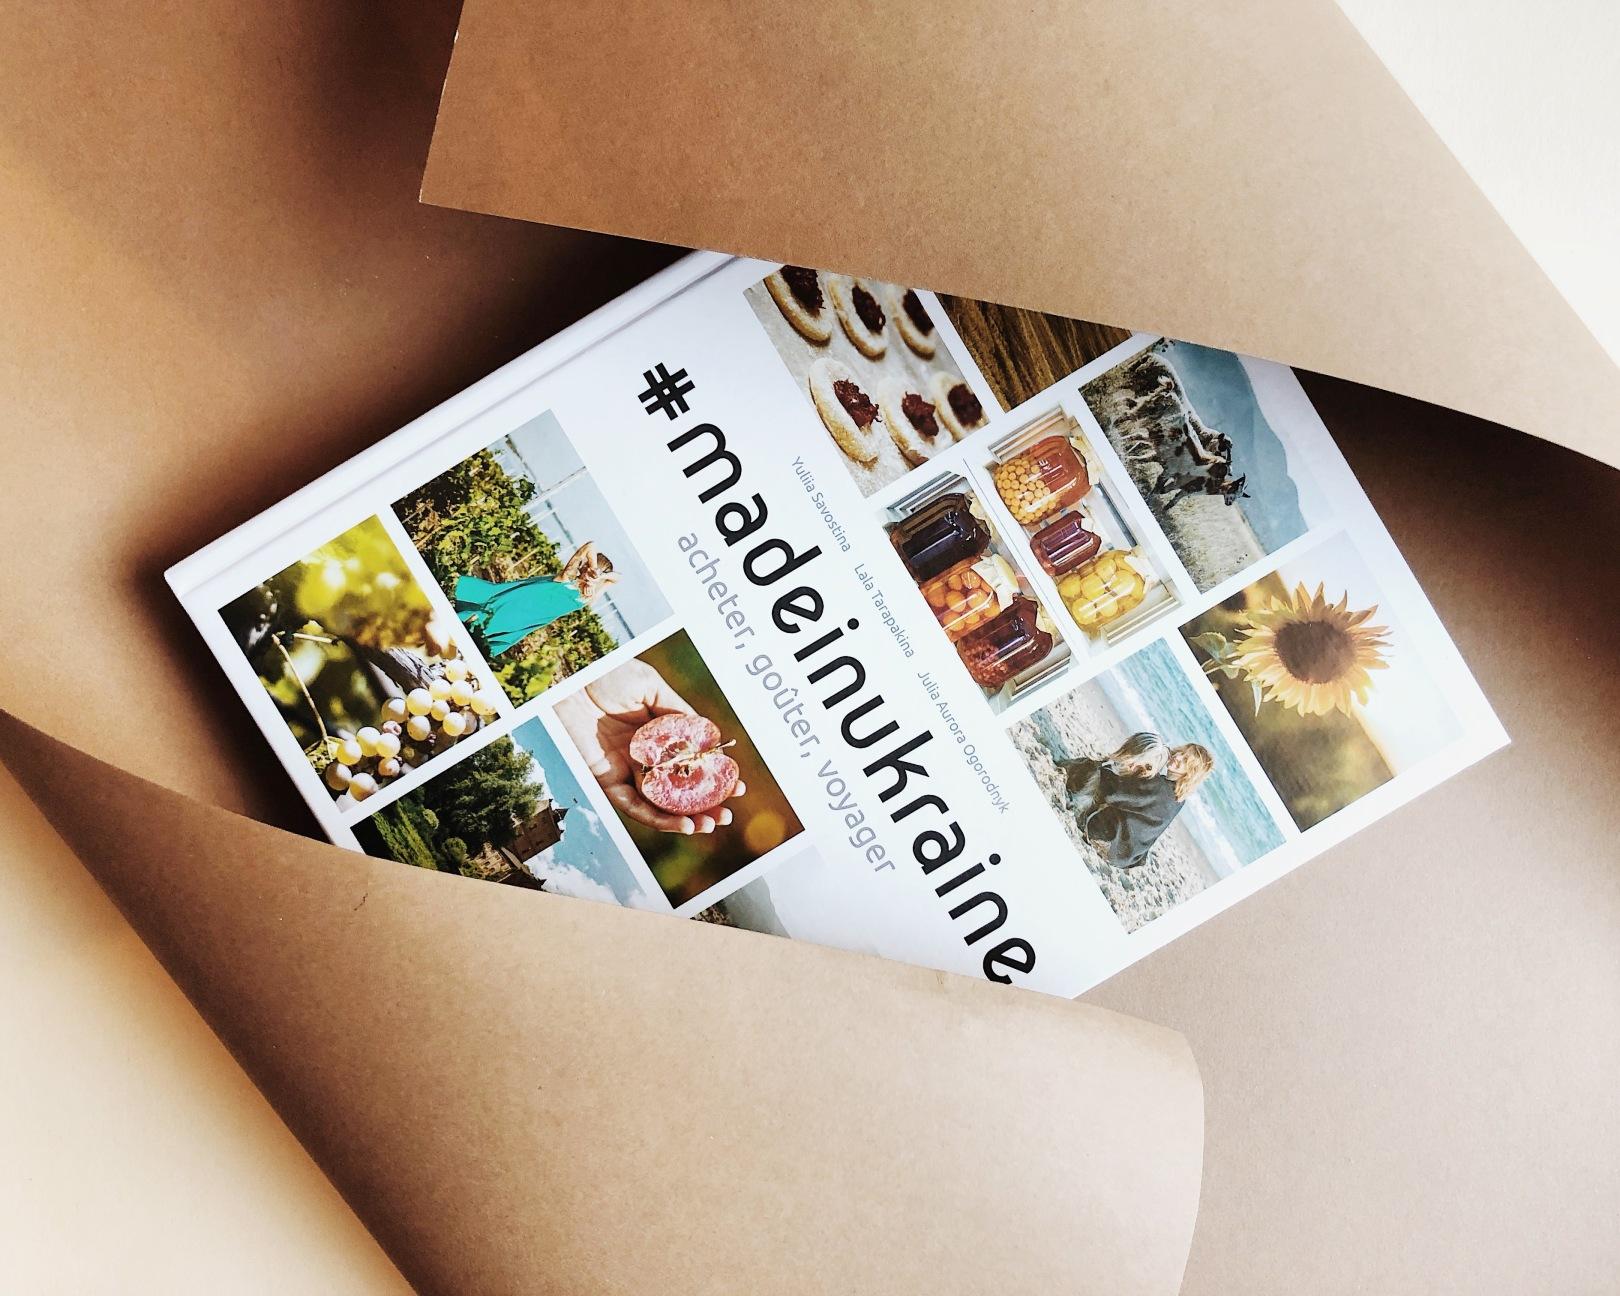 Made in Ukraine book